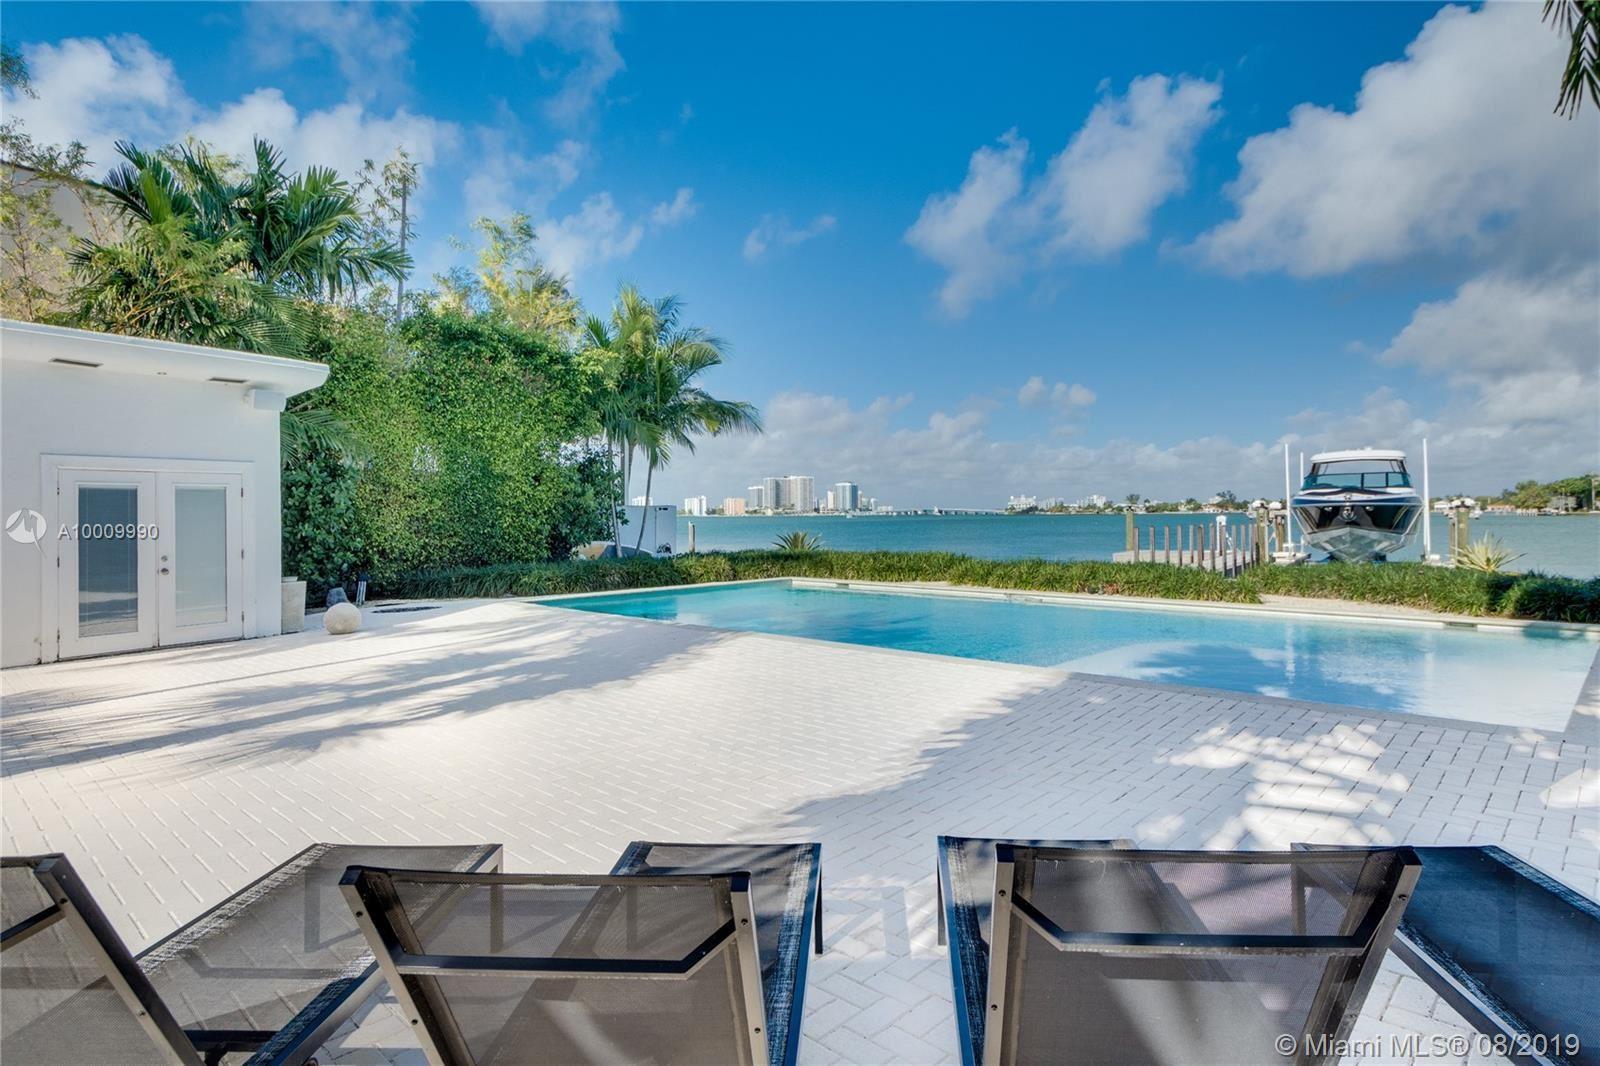 Photo 32 of Listing MLS a10009990 in 6050 N Bay Rd Miami Beach FL 33140